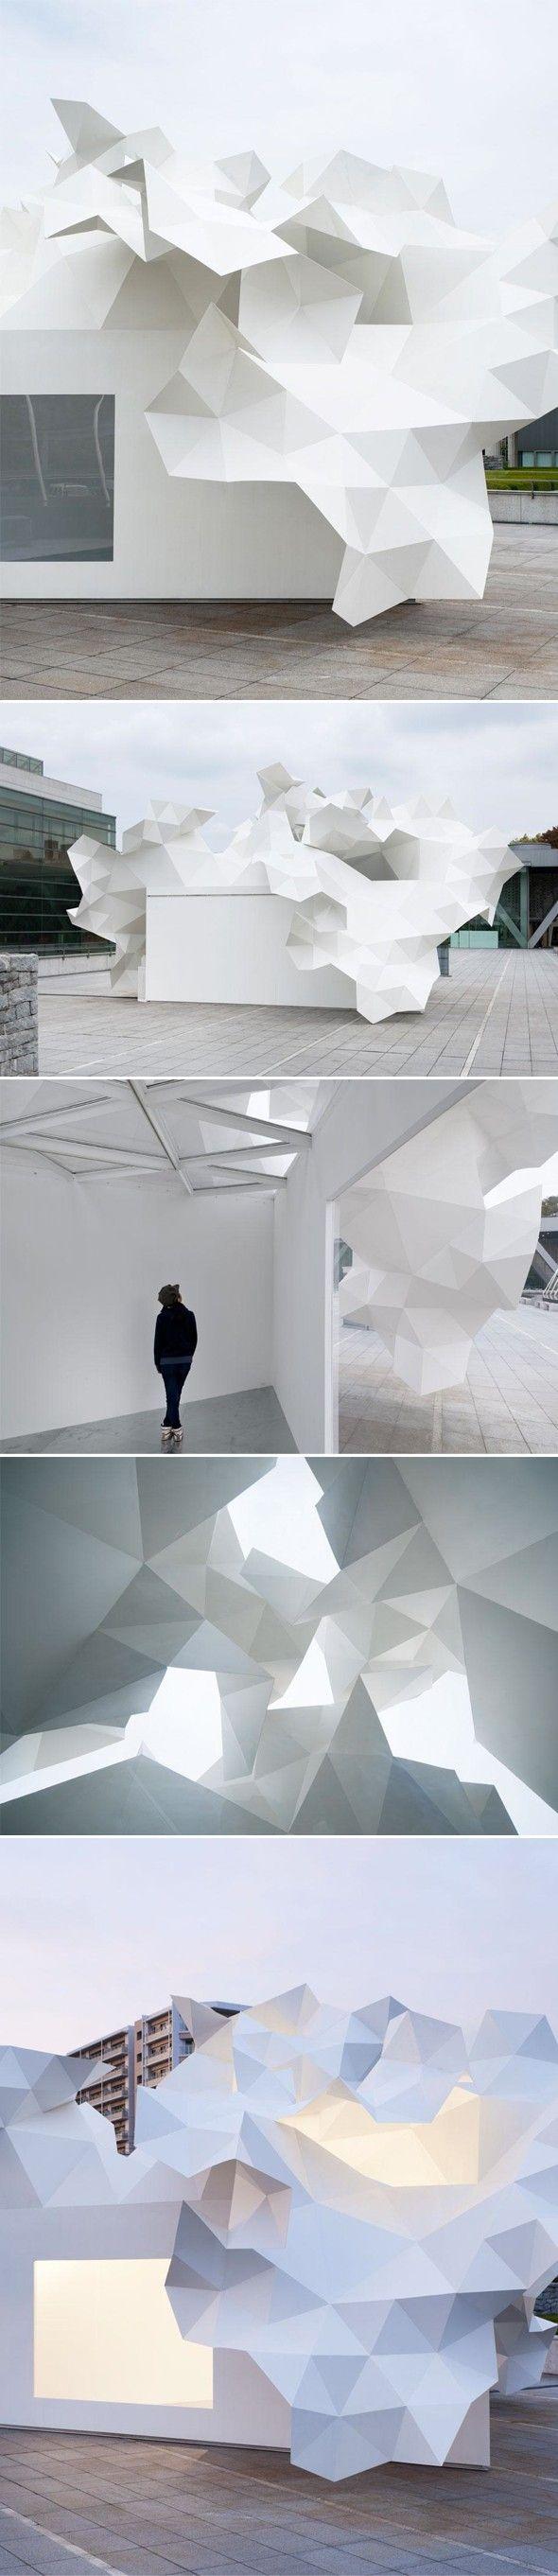 Bloomberg Pavillon par Akihisa Hirata